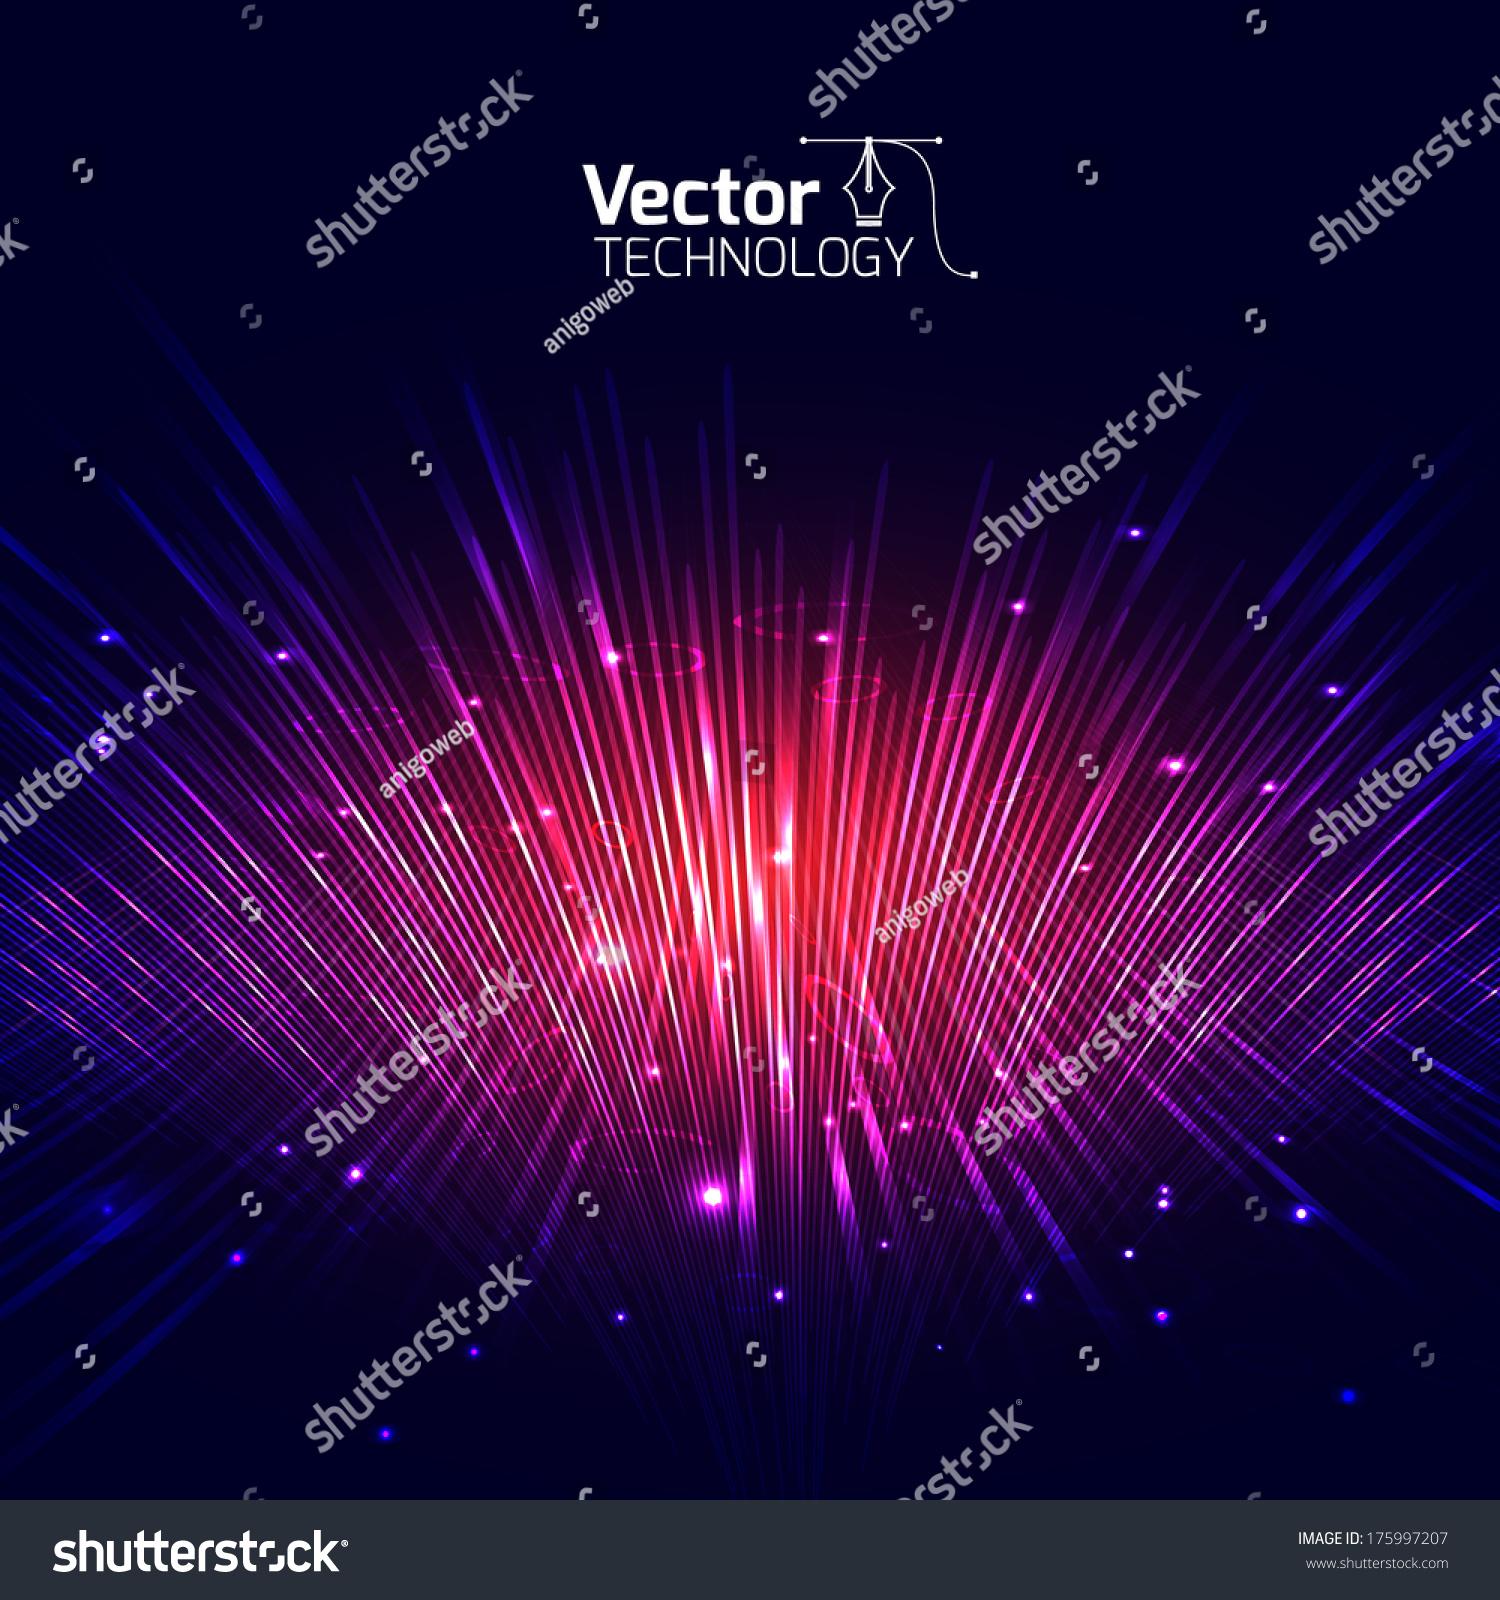 Vector Lines Equalizer 3d - 175997207 : Shutterstock